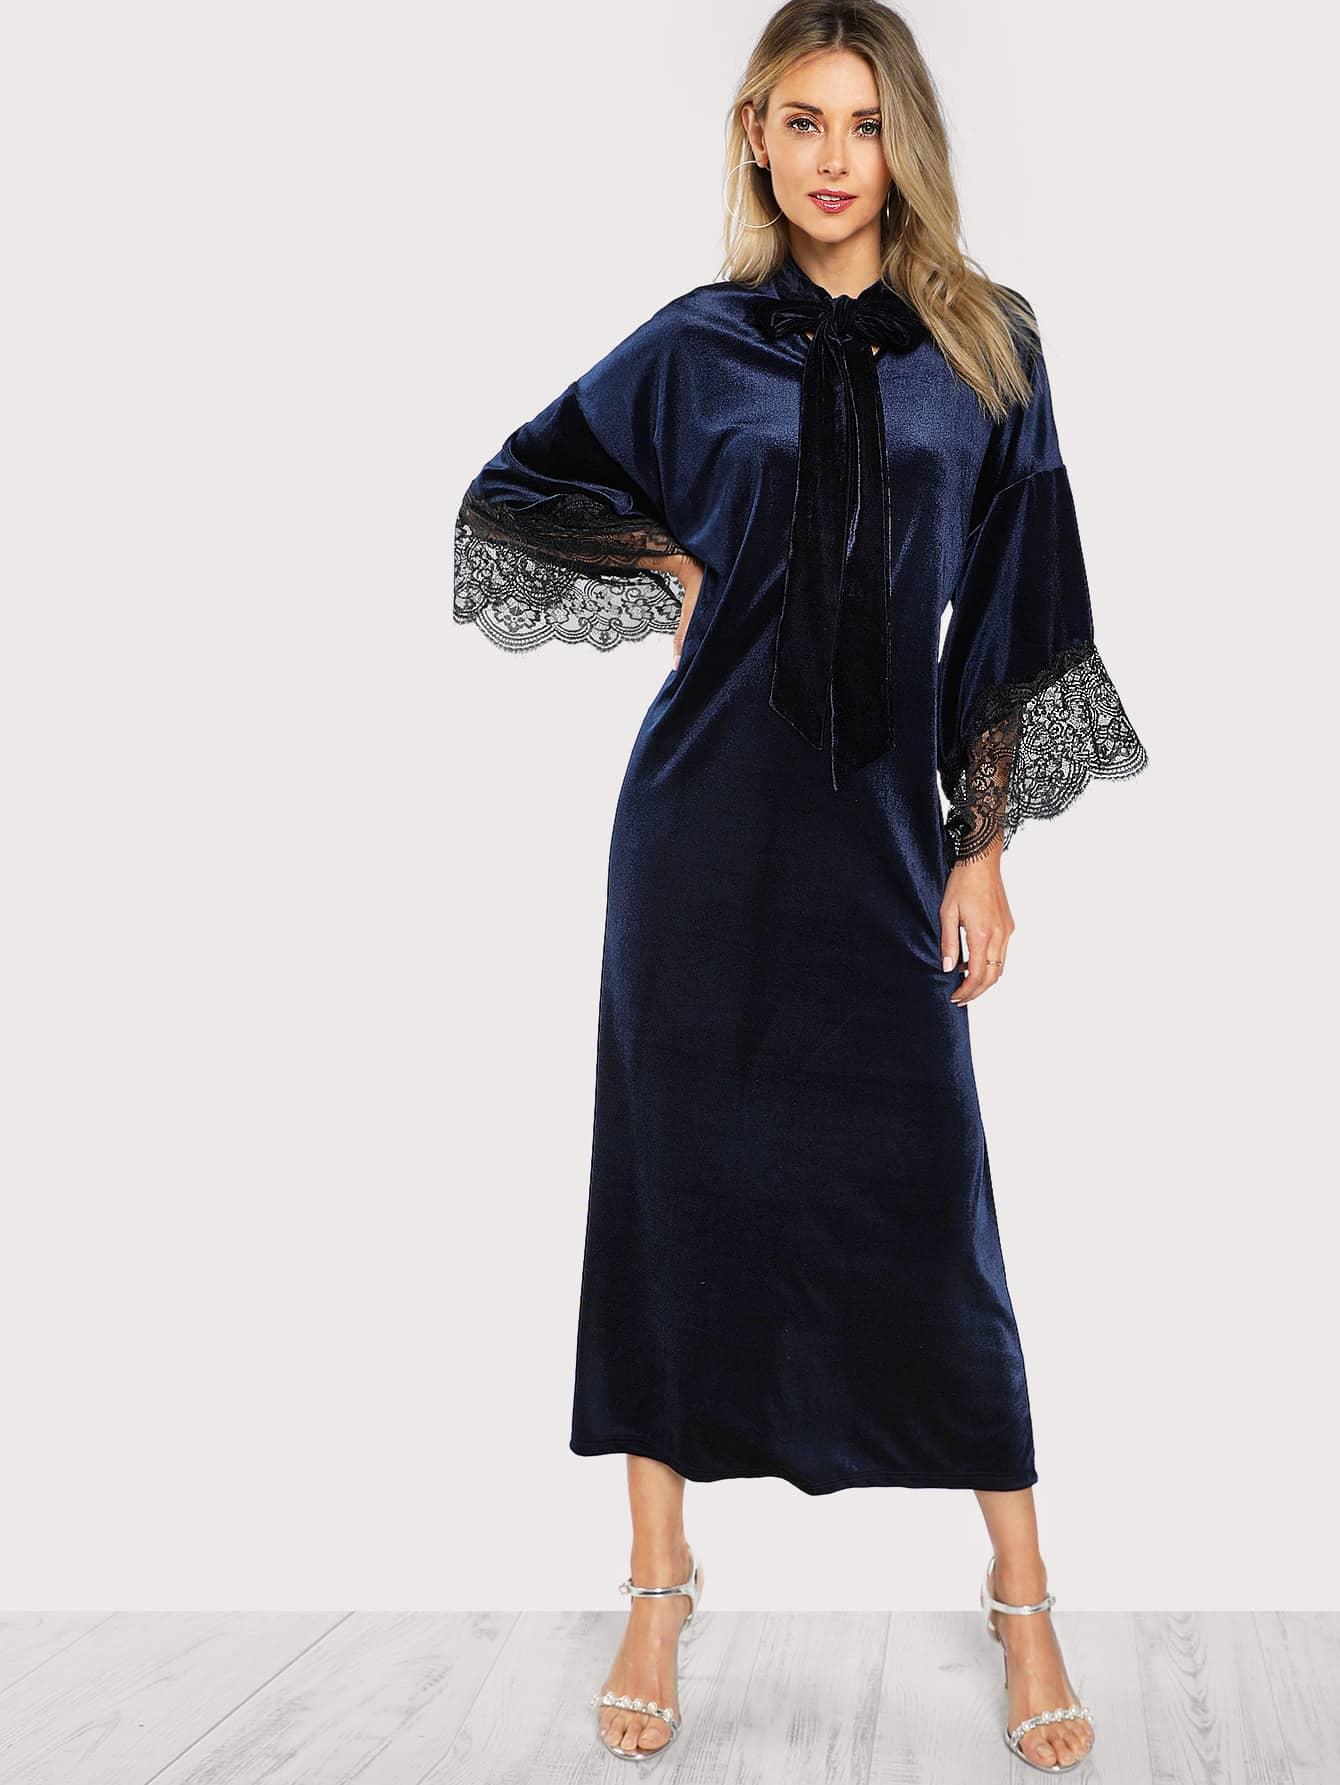 Tie Neck Lace Trim Bell Sleeve Hijab Long Dress